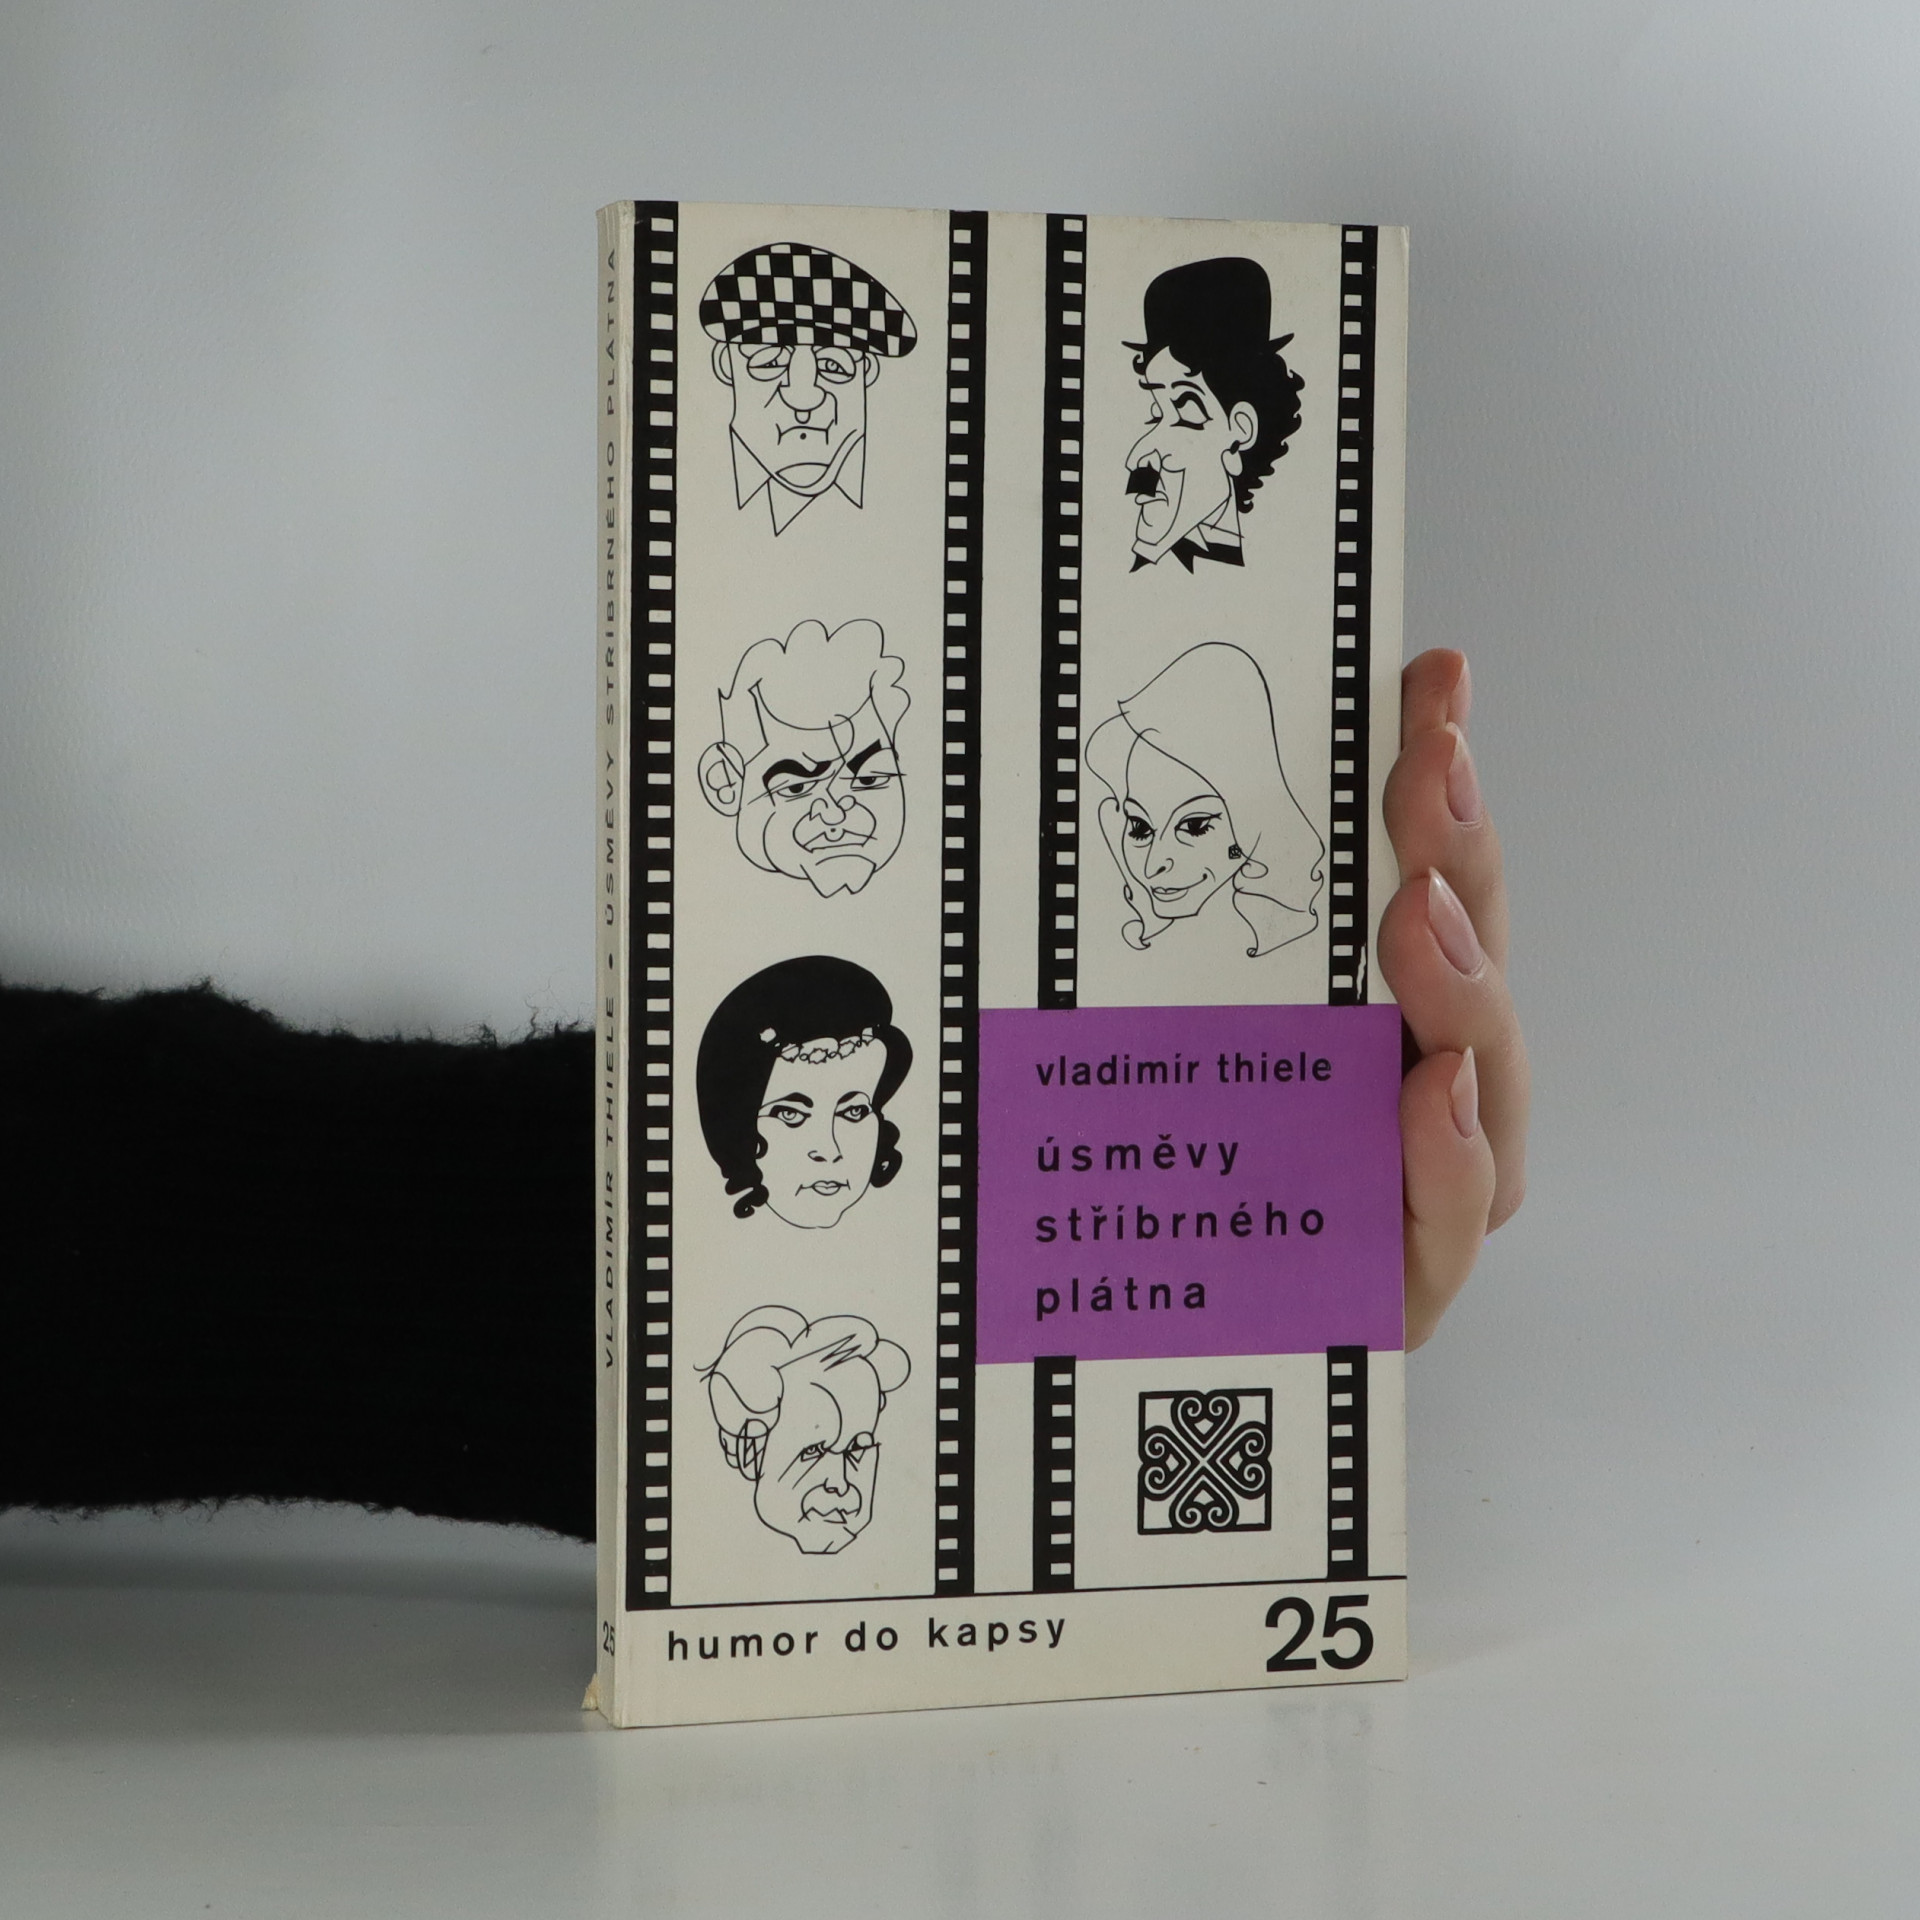 antikvární kniha Úsměvy stříbrného plátna, 1986